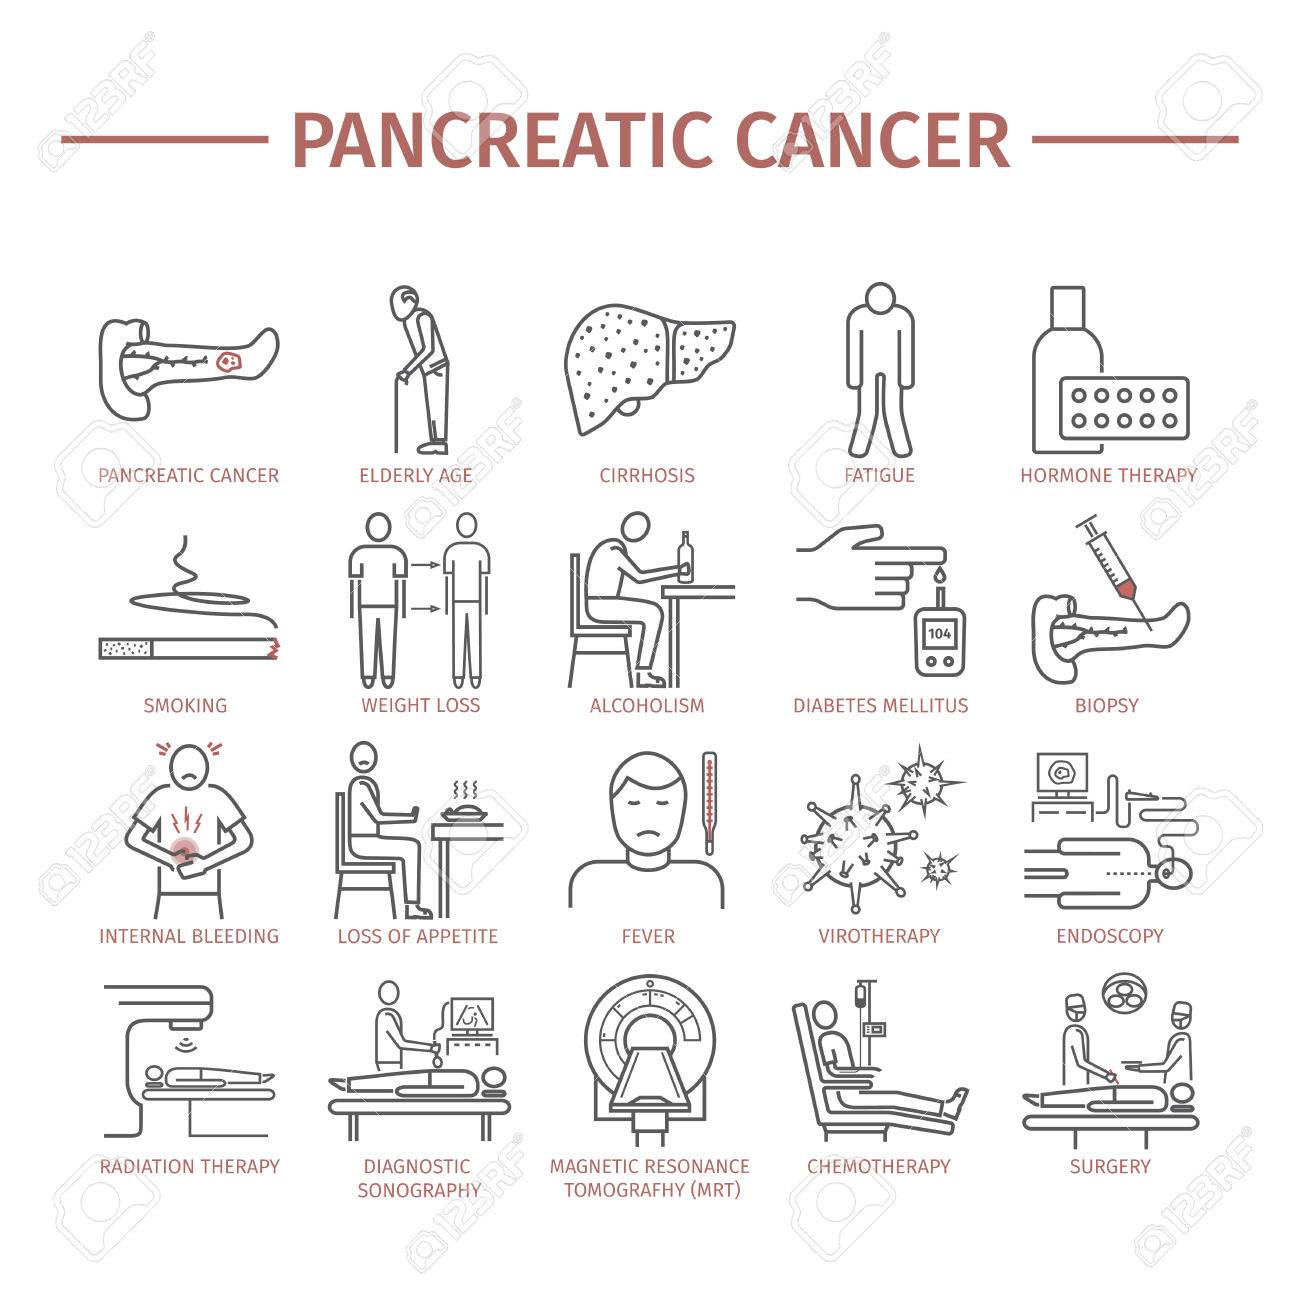 Síntomas Del Cáncer De Páncreas Pancreático. Causas. Fotos, Retratos ...